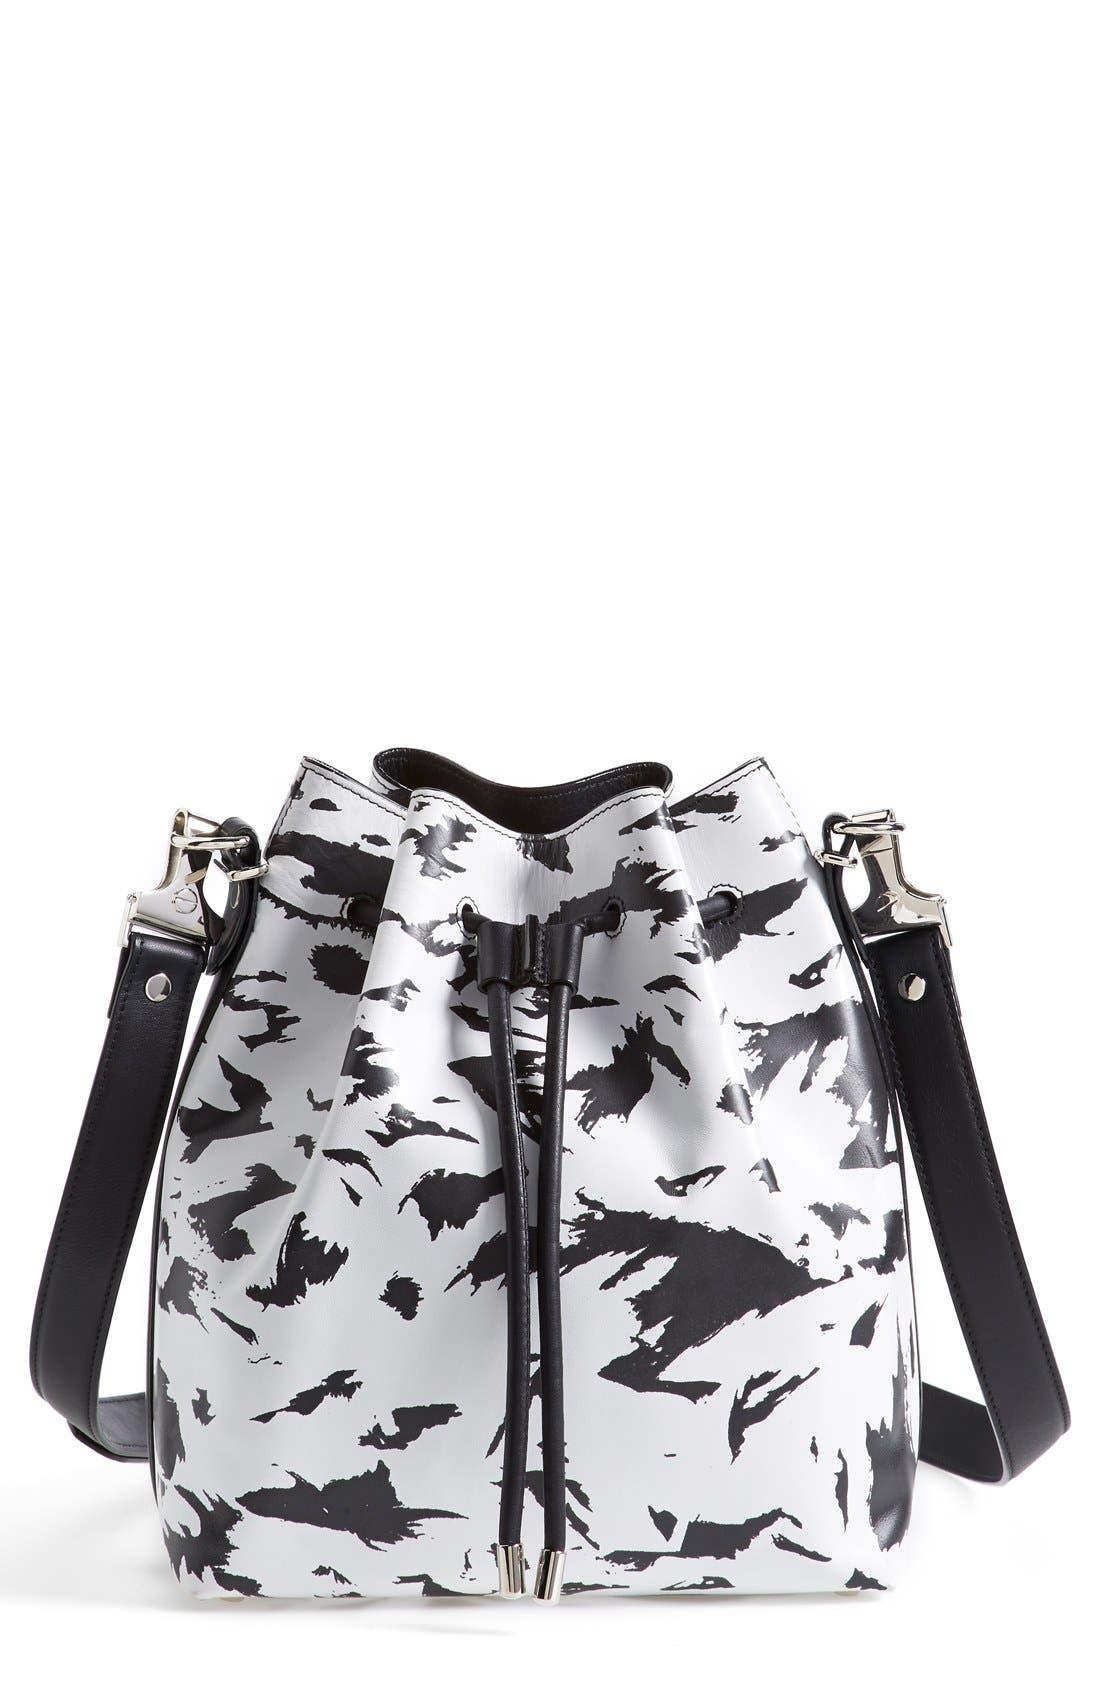 Main Image - Proenza Schouler 'Medium' Feather Print Leather Bucket Bag